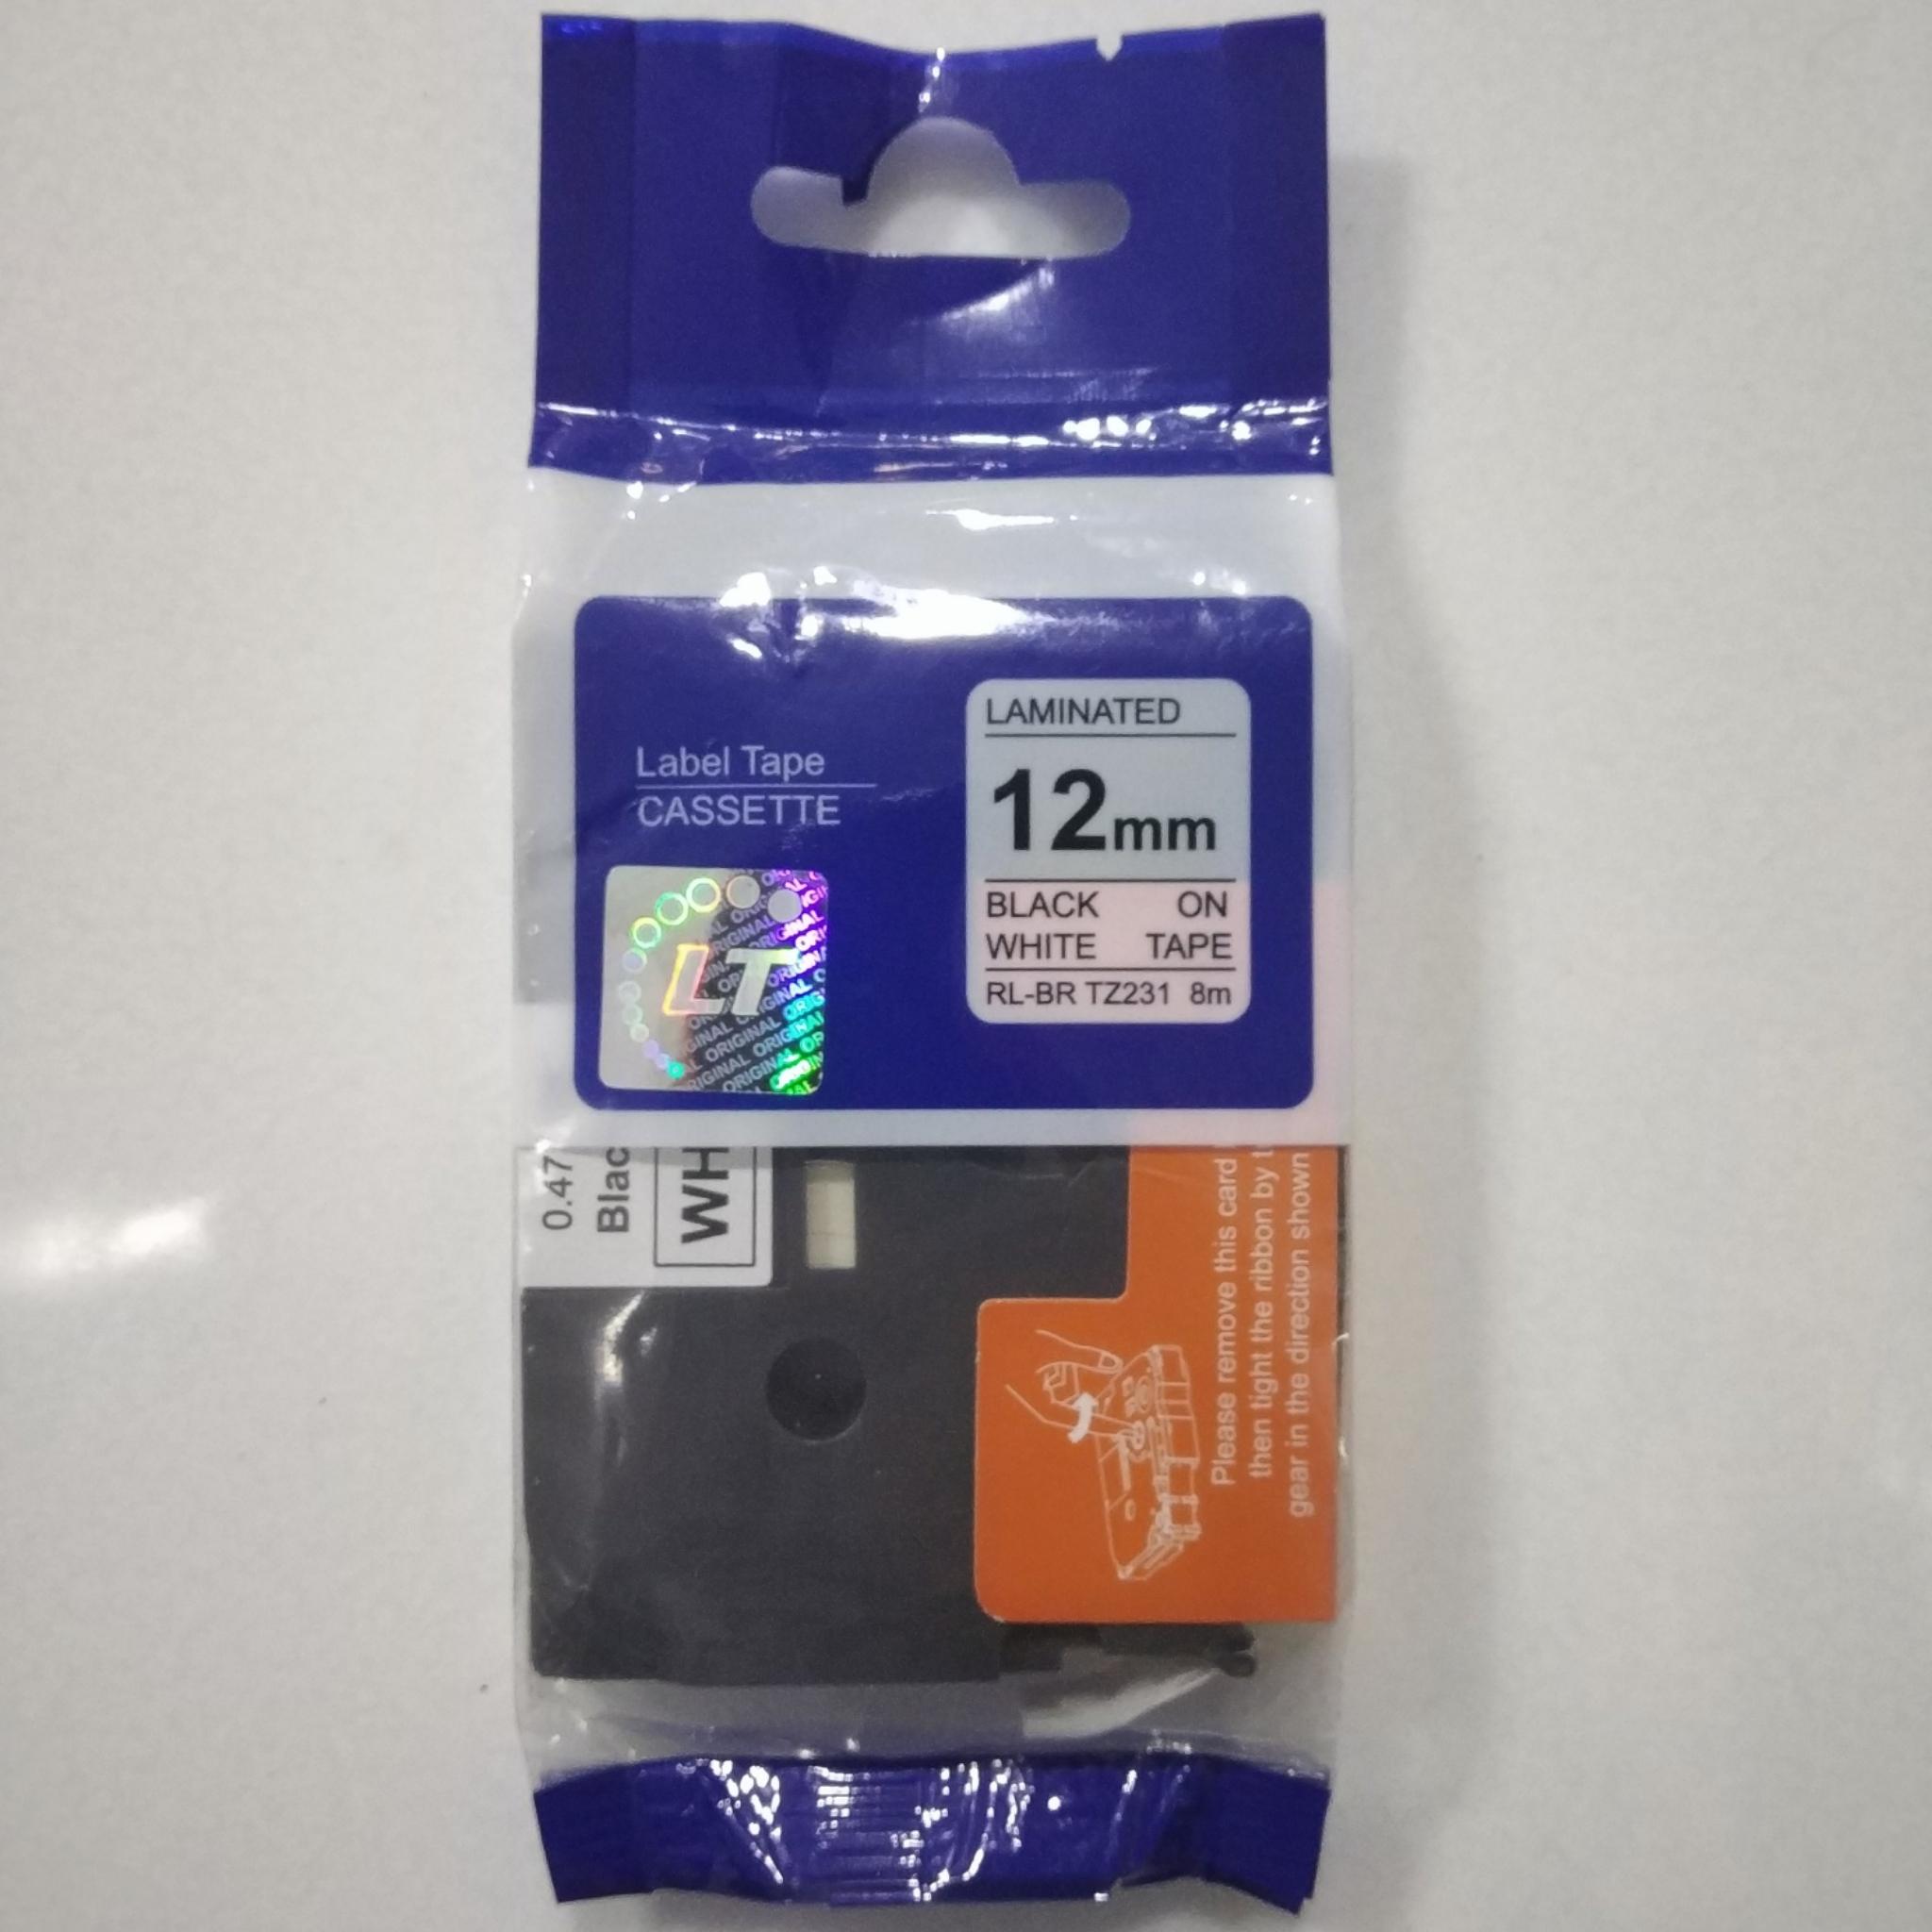 LT 231 Laminated 12mm Black on White Label Tape